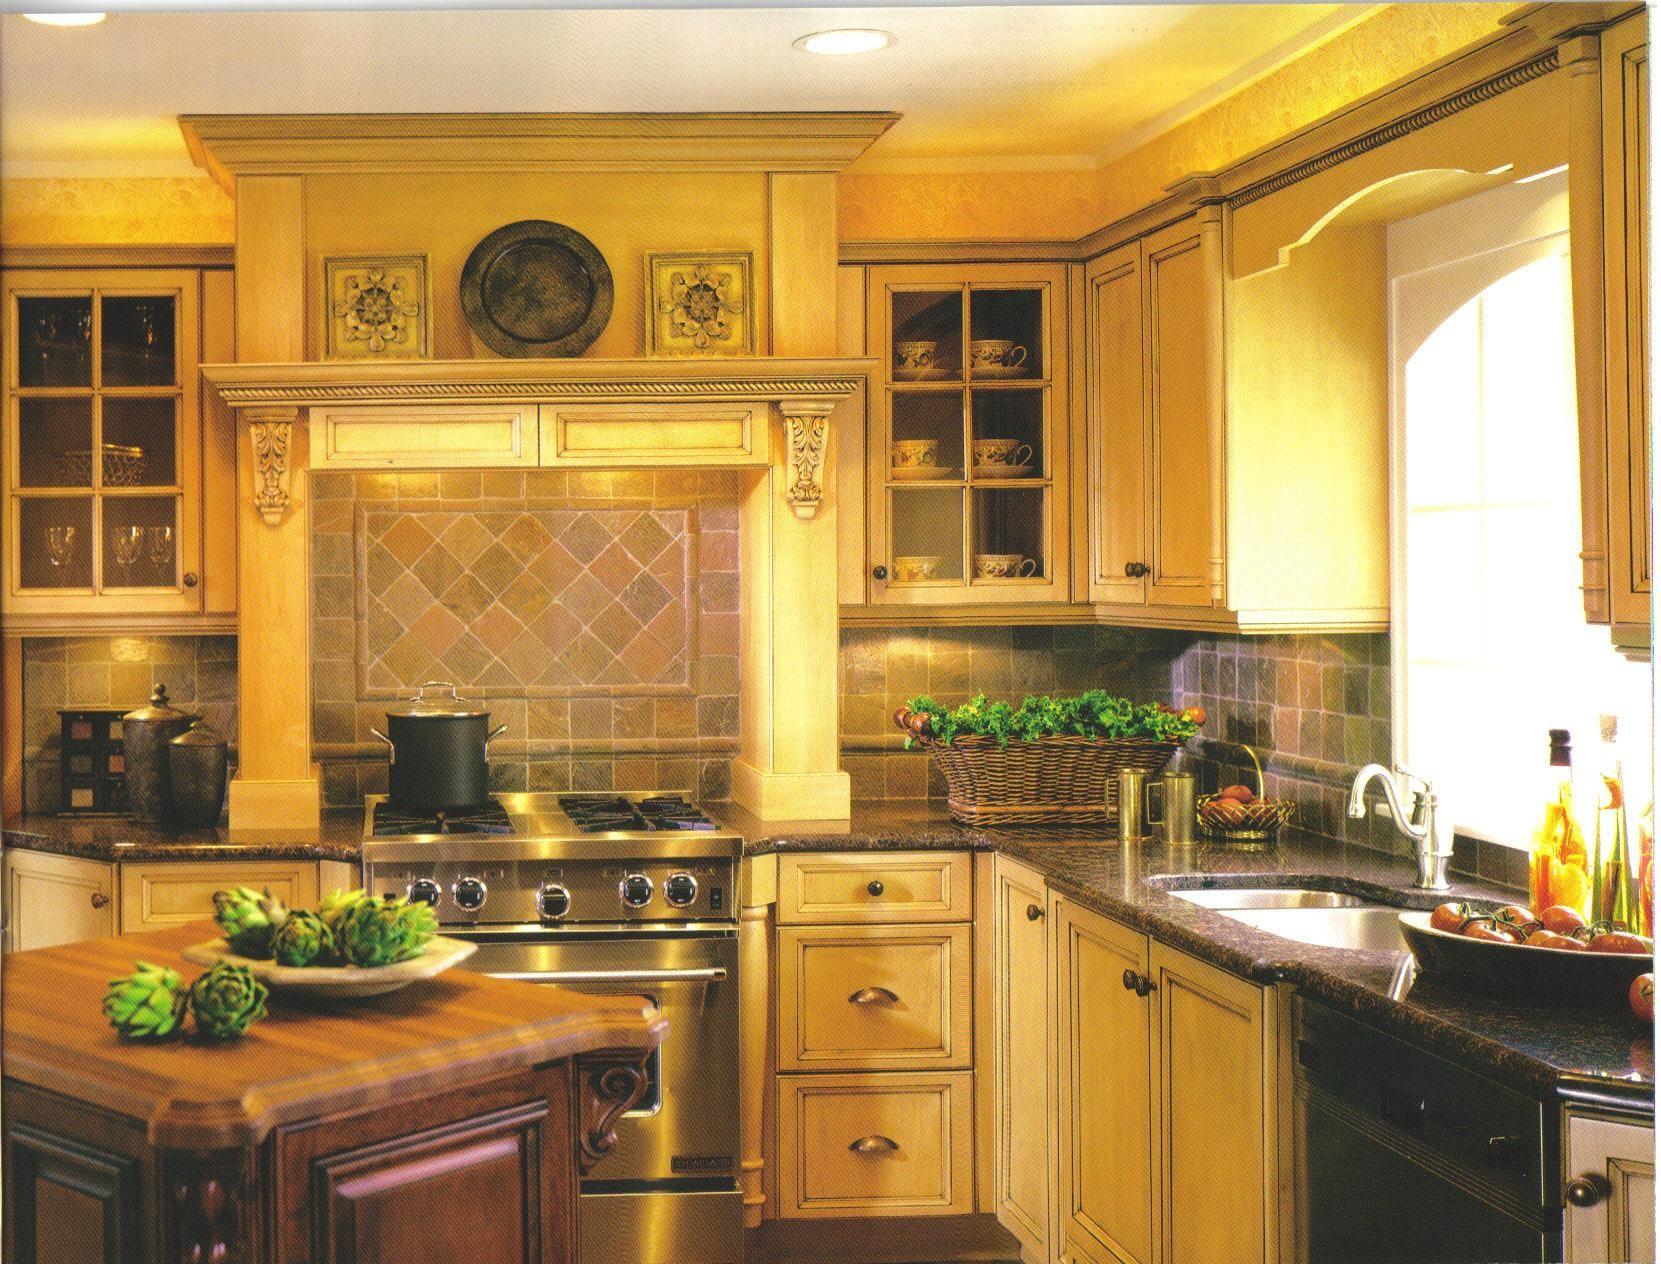 kitchen cabinet color schemes - Google Search | Kitchen ...